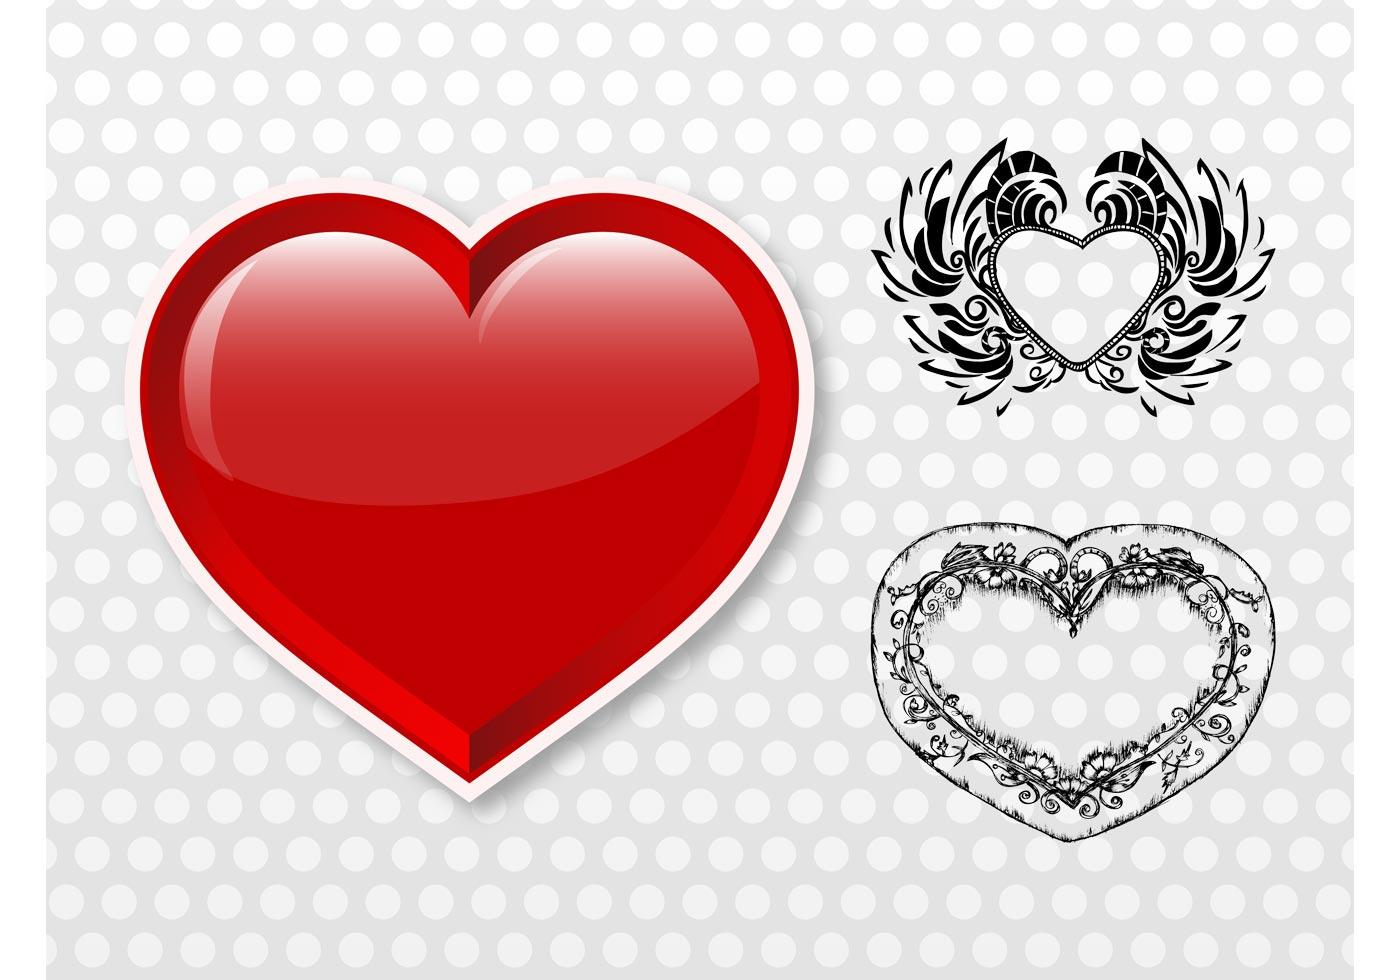 Heart Illustrations - Download Free Vector Art, Stock ...